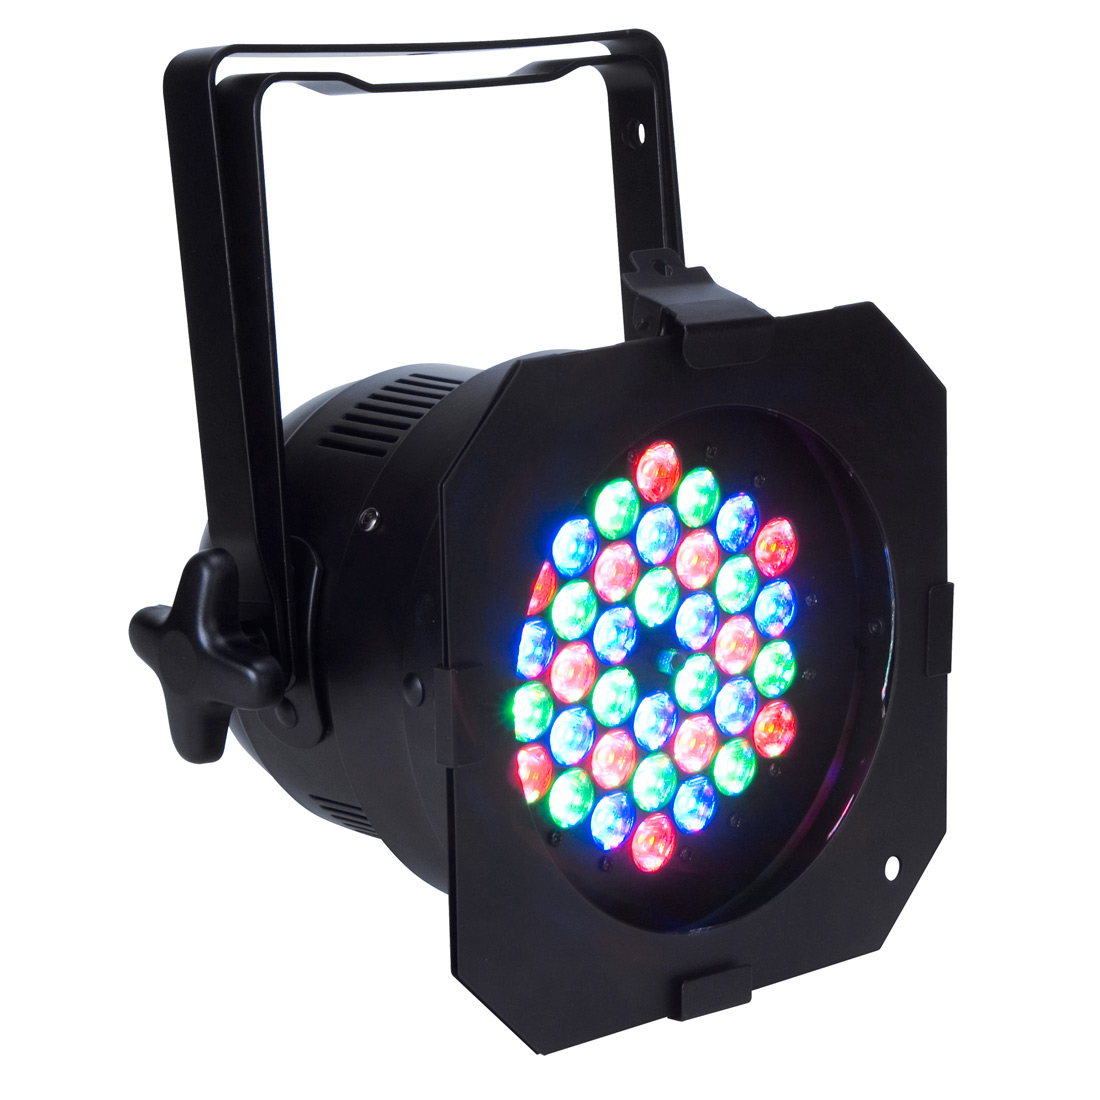 PROPAR56 RGB